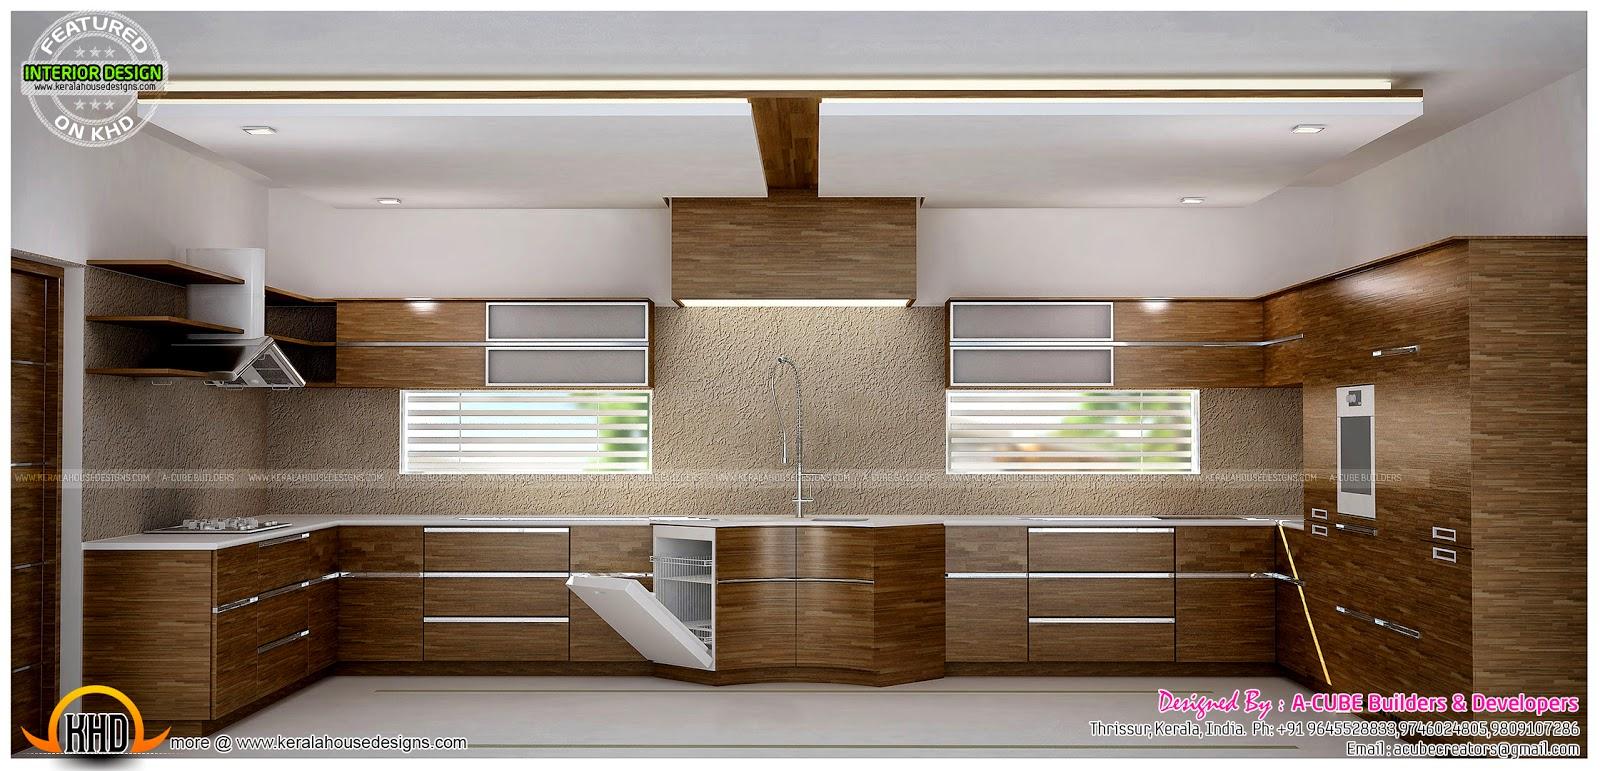 Master Bedrooms And Kitchen Interior Kerala Home Design